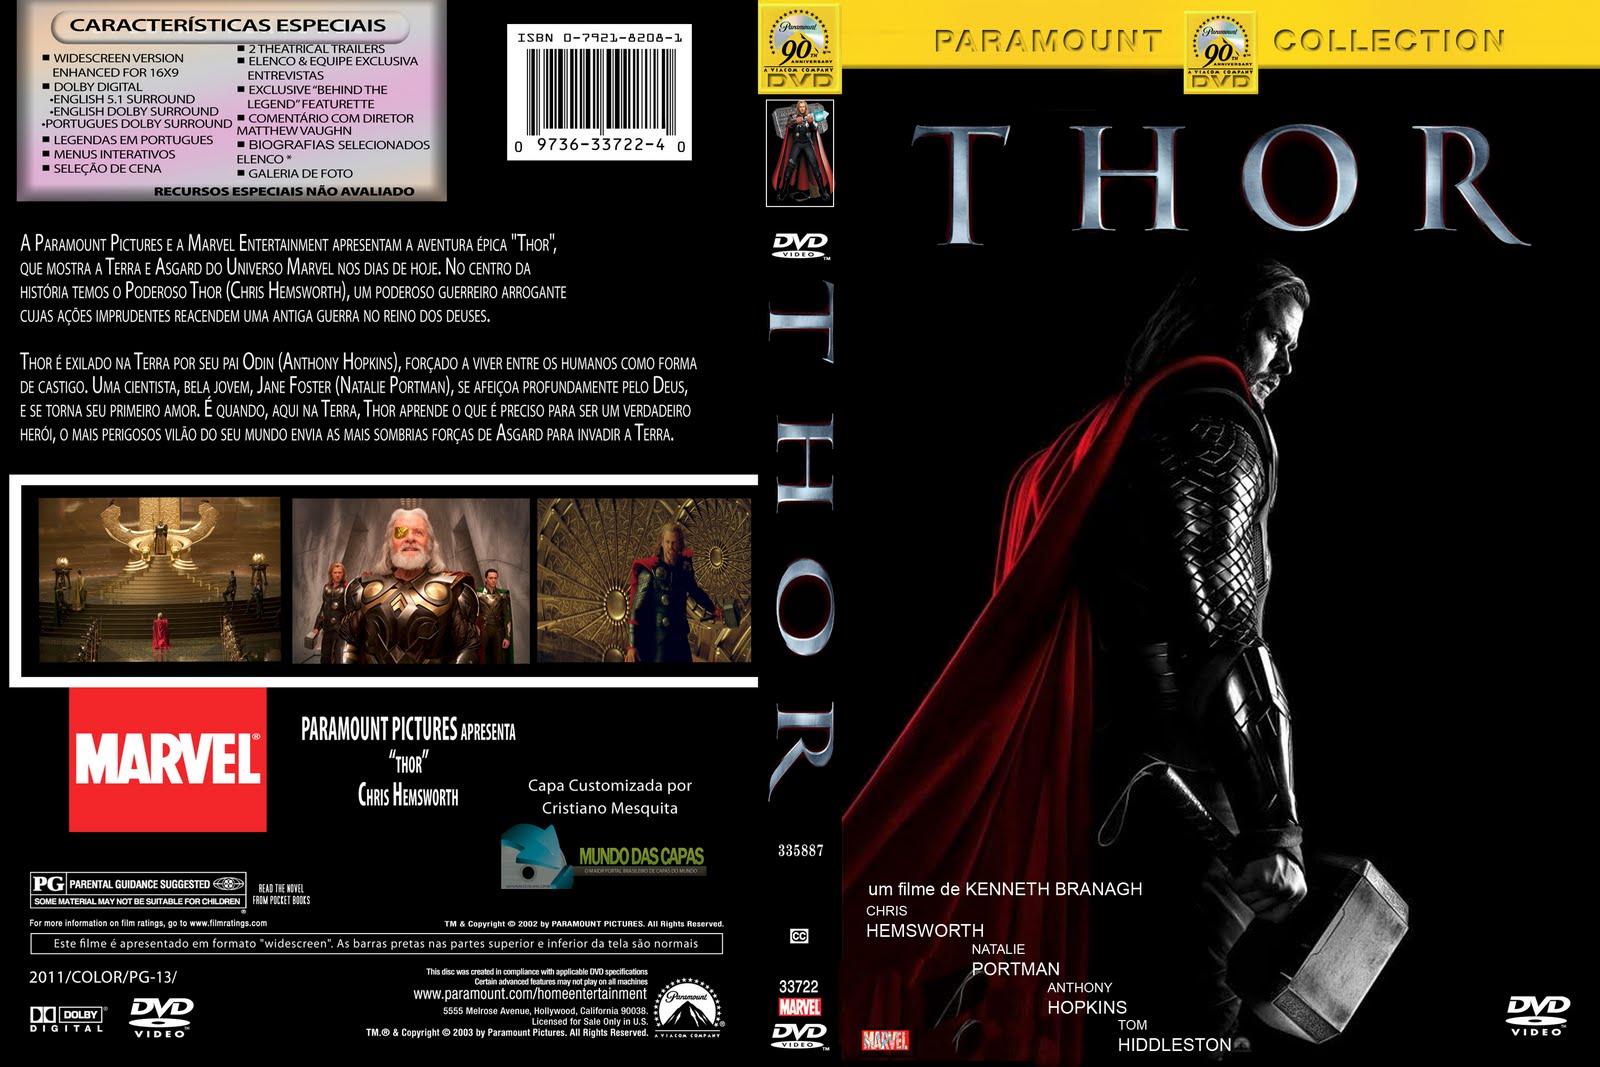 http://2.bp.blogspot.com/-DxQirq5PqW0/TrqLPfIs7hI/AAAAAAAAB5A/PC_e1JggO0g/s1600/Thor.jpg